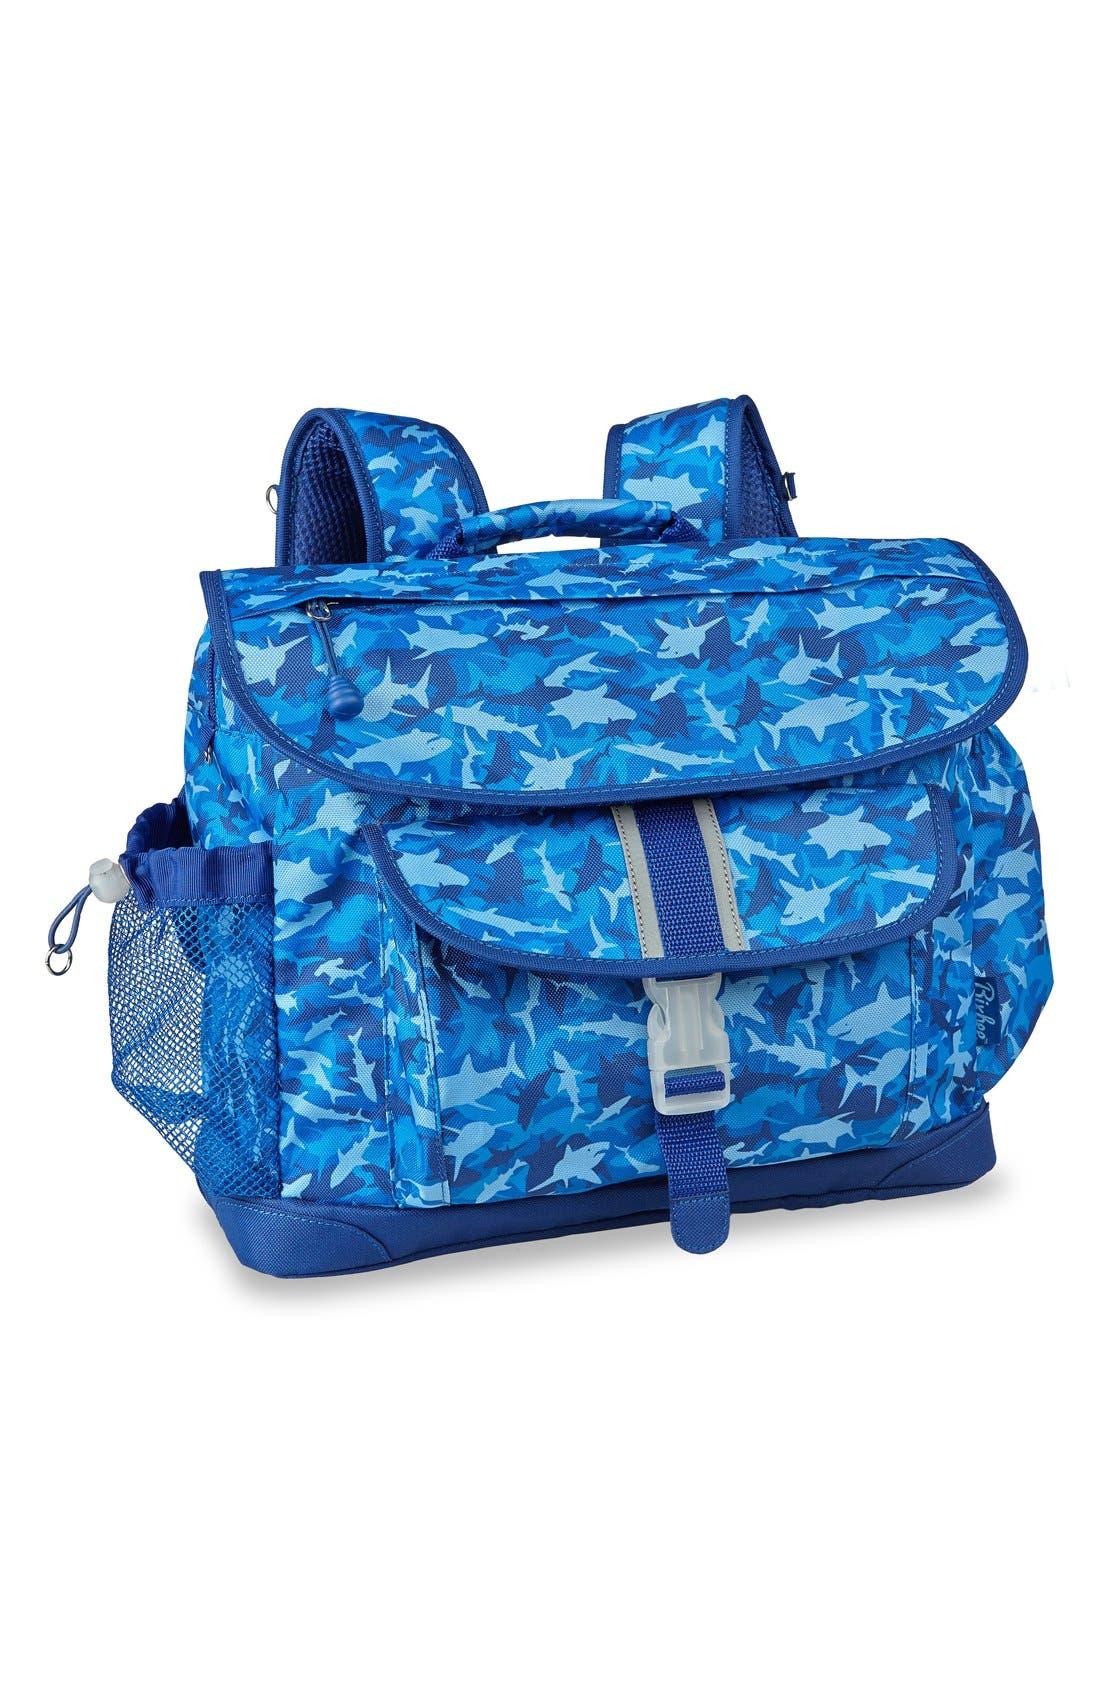 BIXBEE Large Shark Camo Water Resistant Backpack